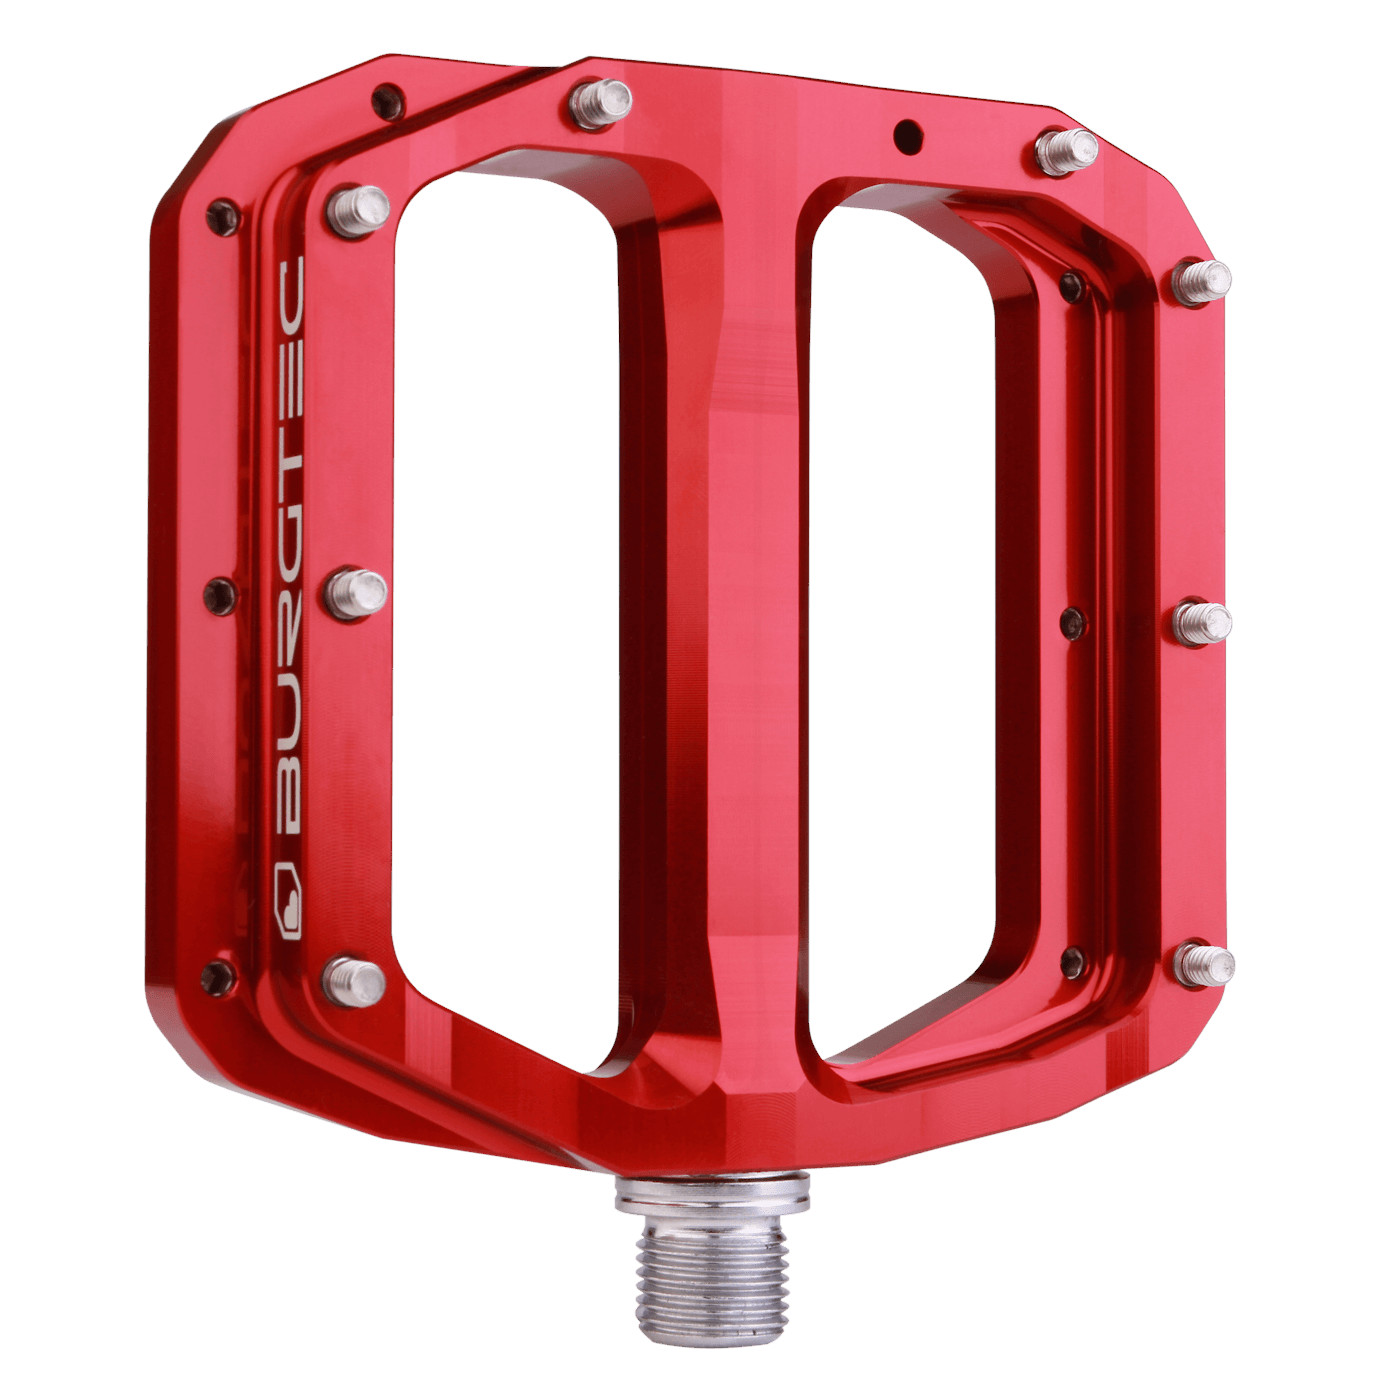 Pedal Pin Set Screws Pedal Grub Spikes Dirt Jump Downhill XC Freeride Universal